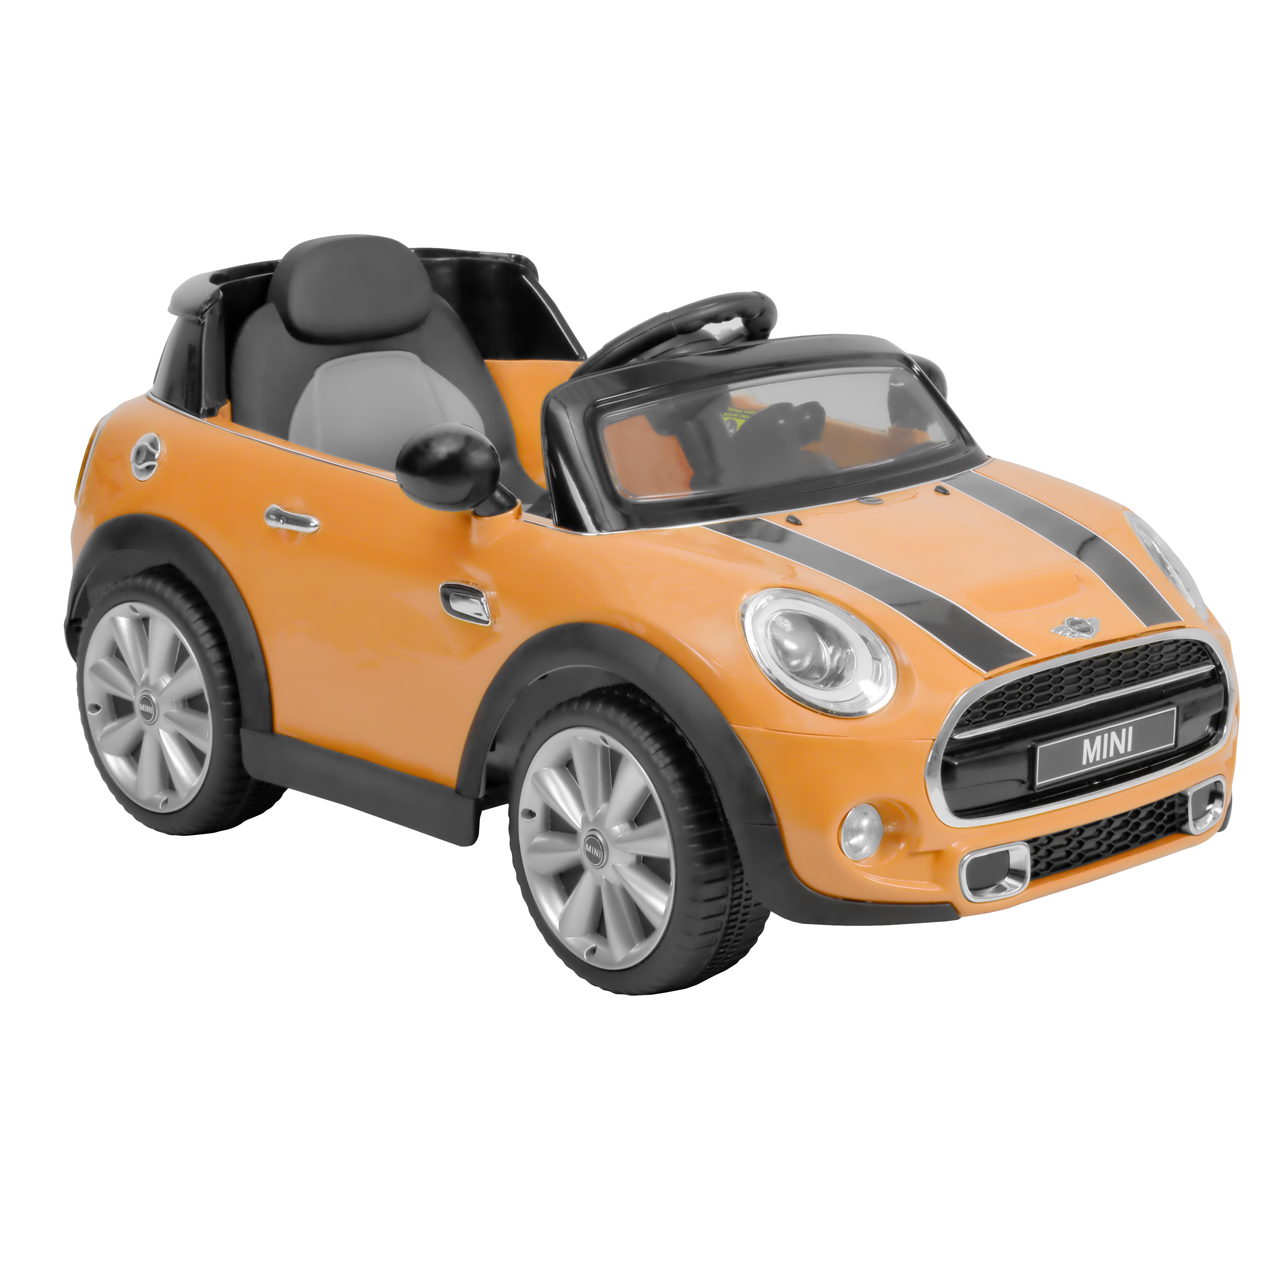 MINI HATCH YELLOW - akumulátorové autíčko - vozítko